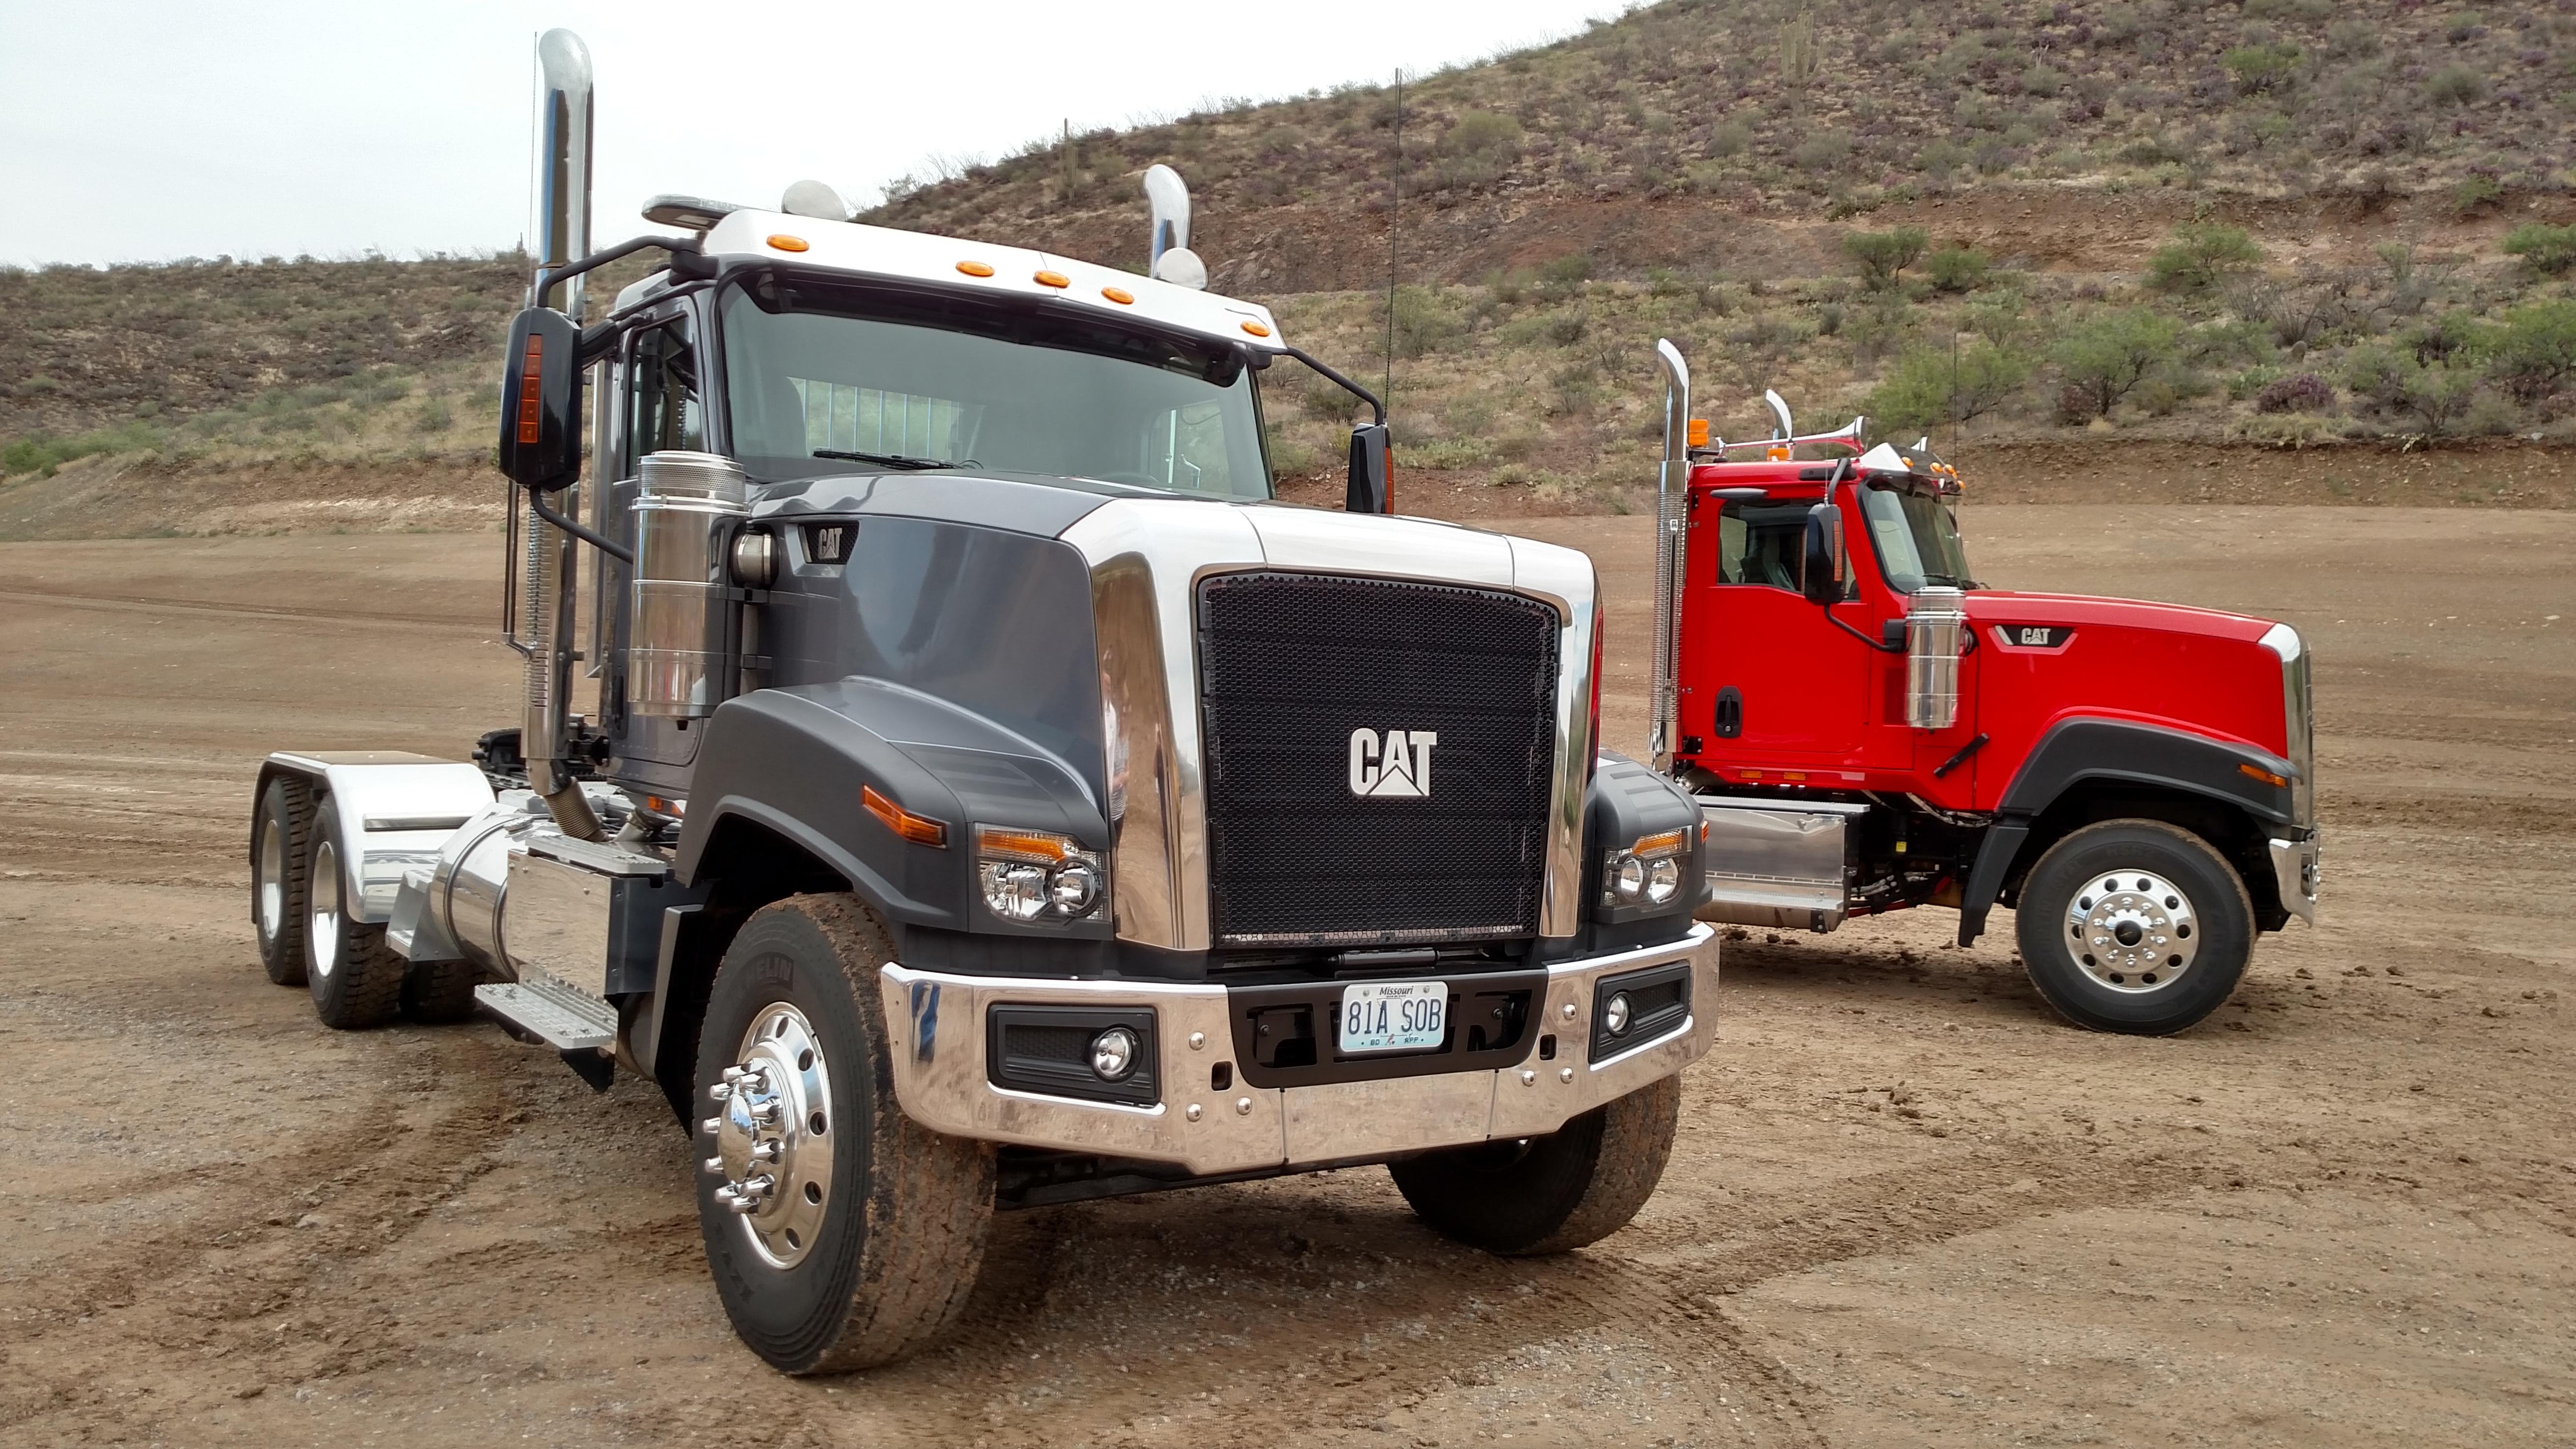 Cat to Split with Navistar, Build Own Vocational Trucks